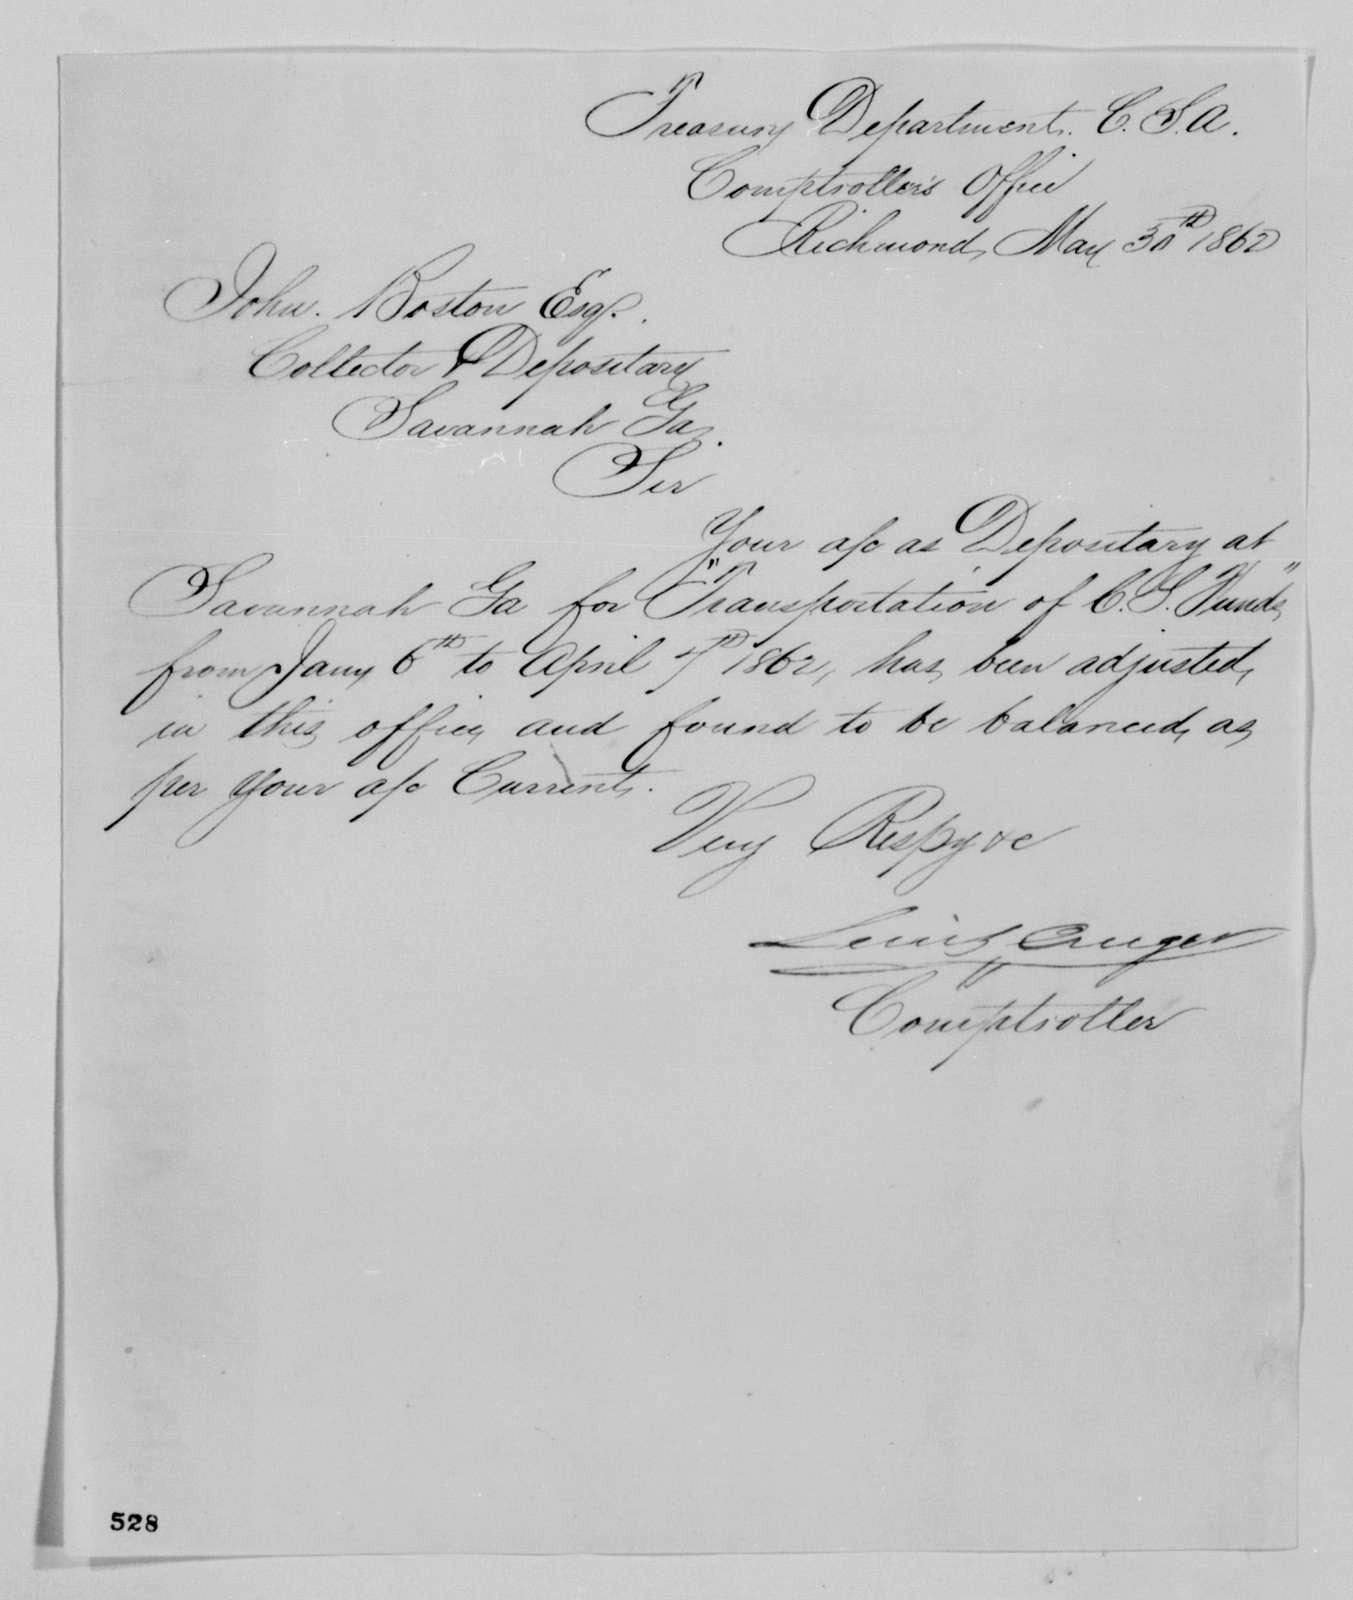 Confederate States of America records: Microfilm Reel 46